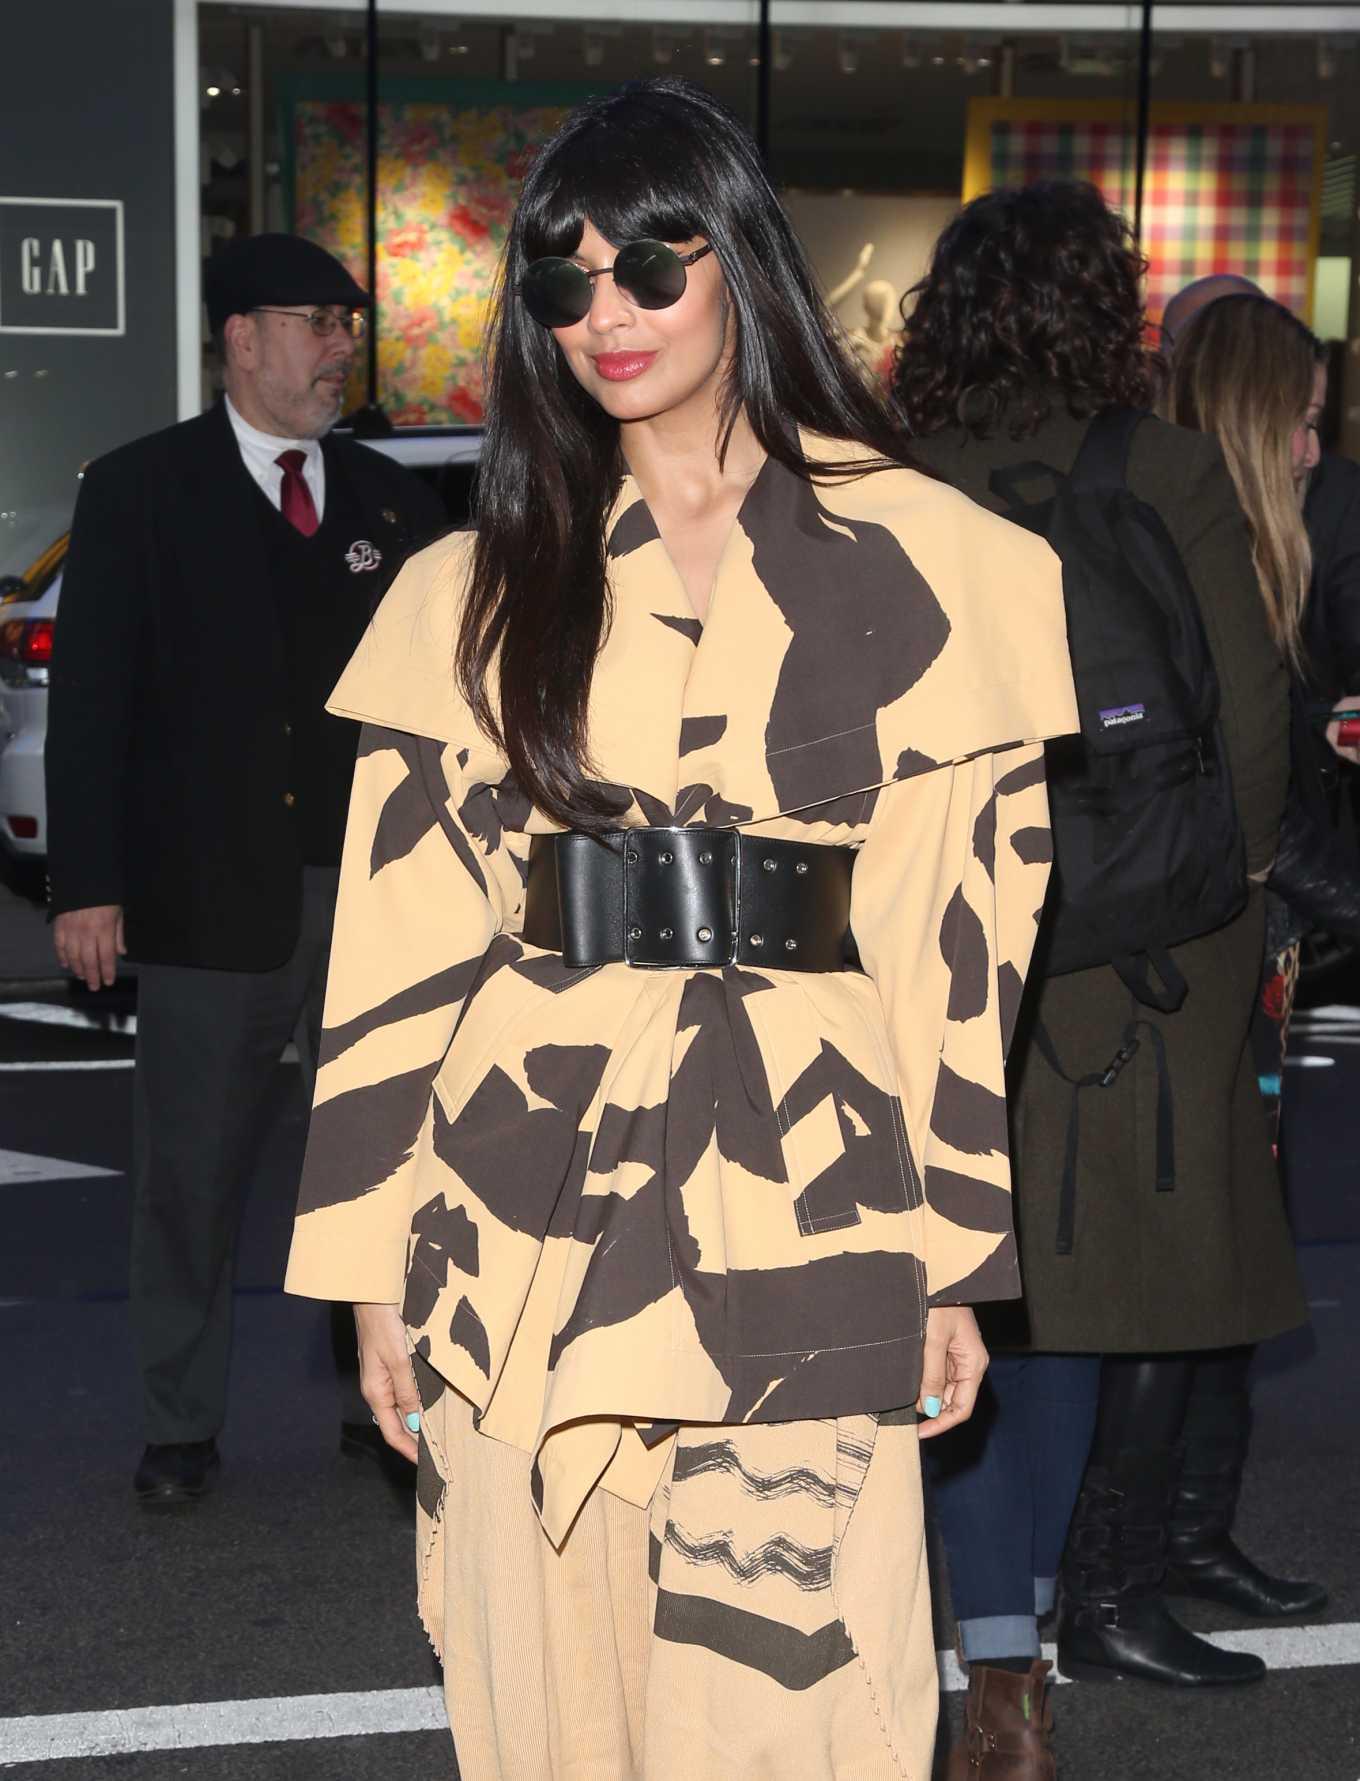 Jameela Jamil at 'Good Morning America' in New York